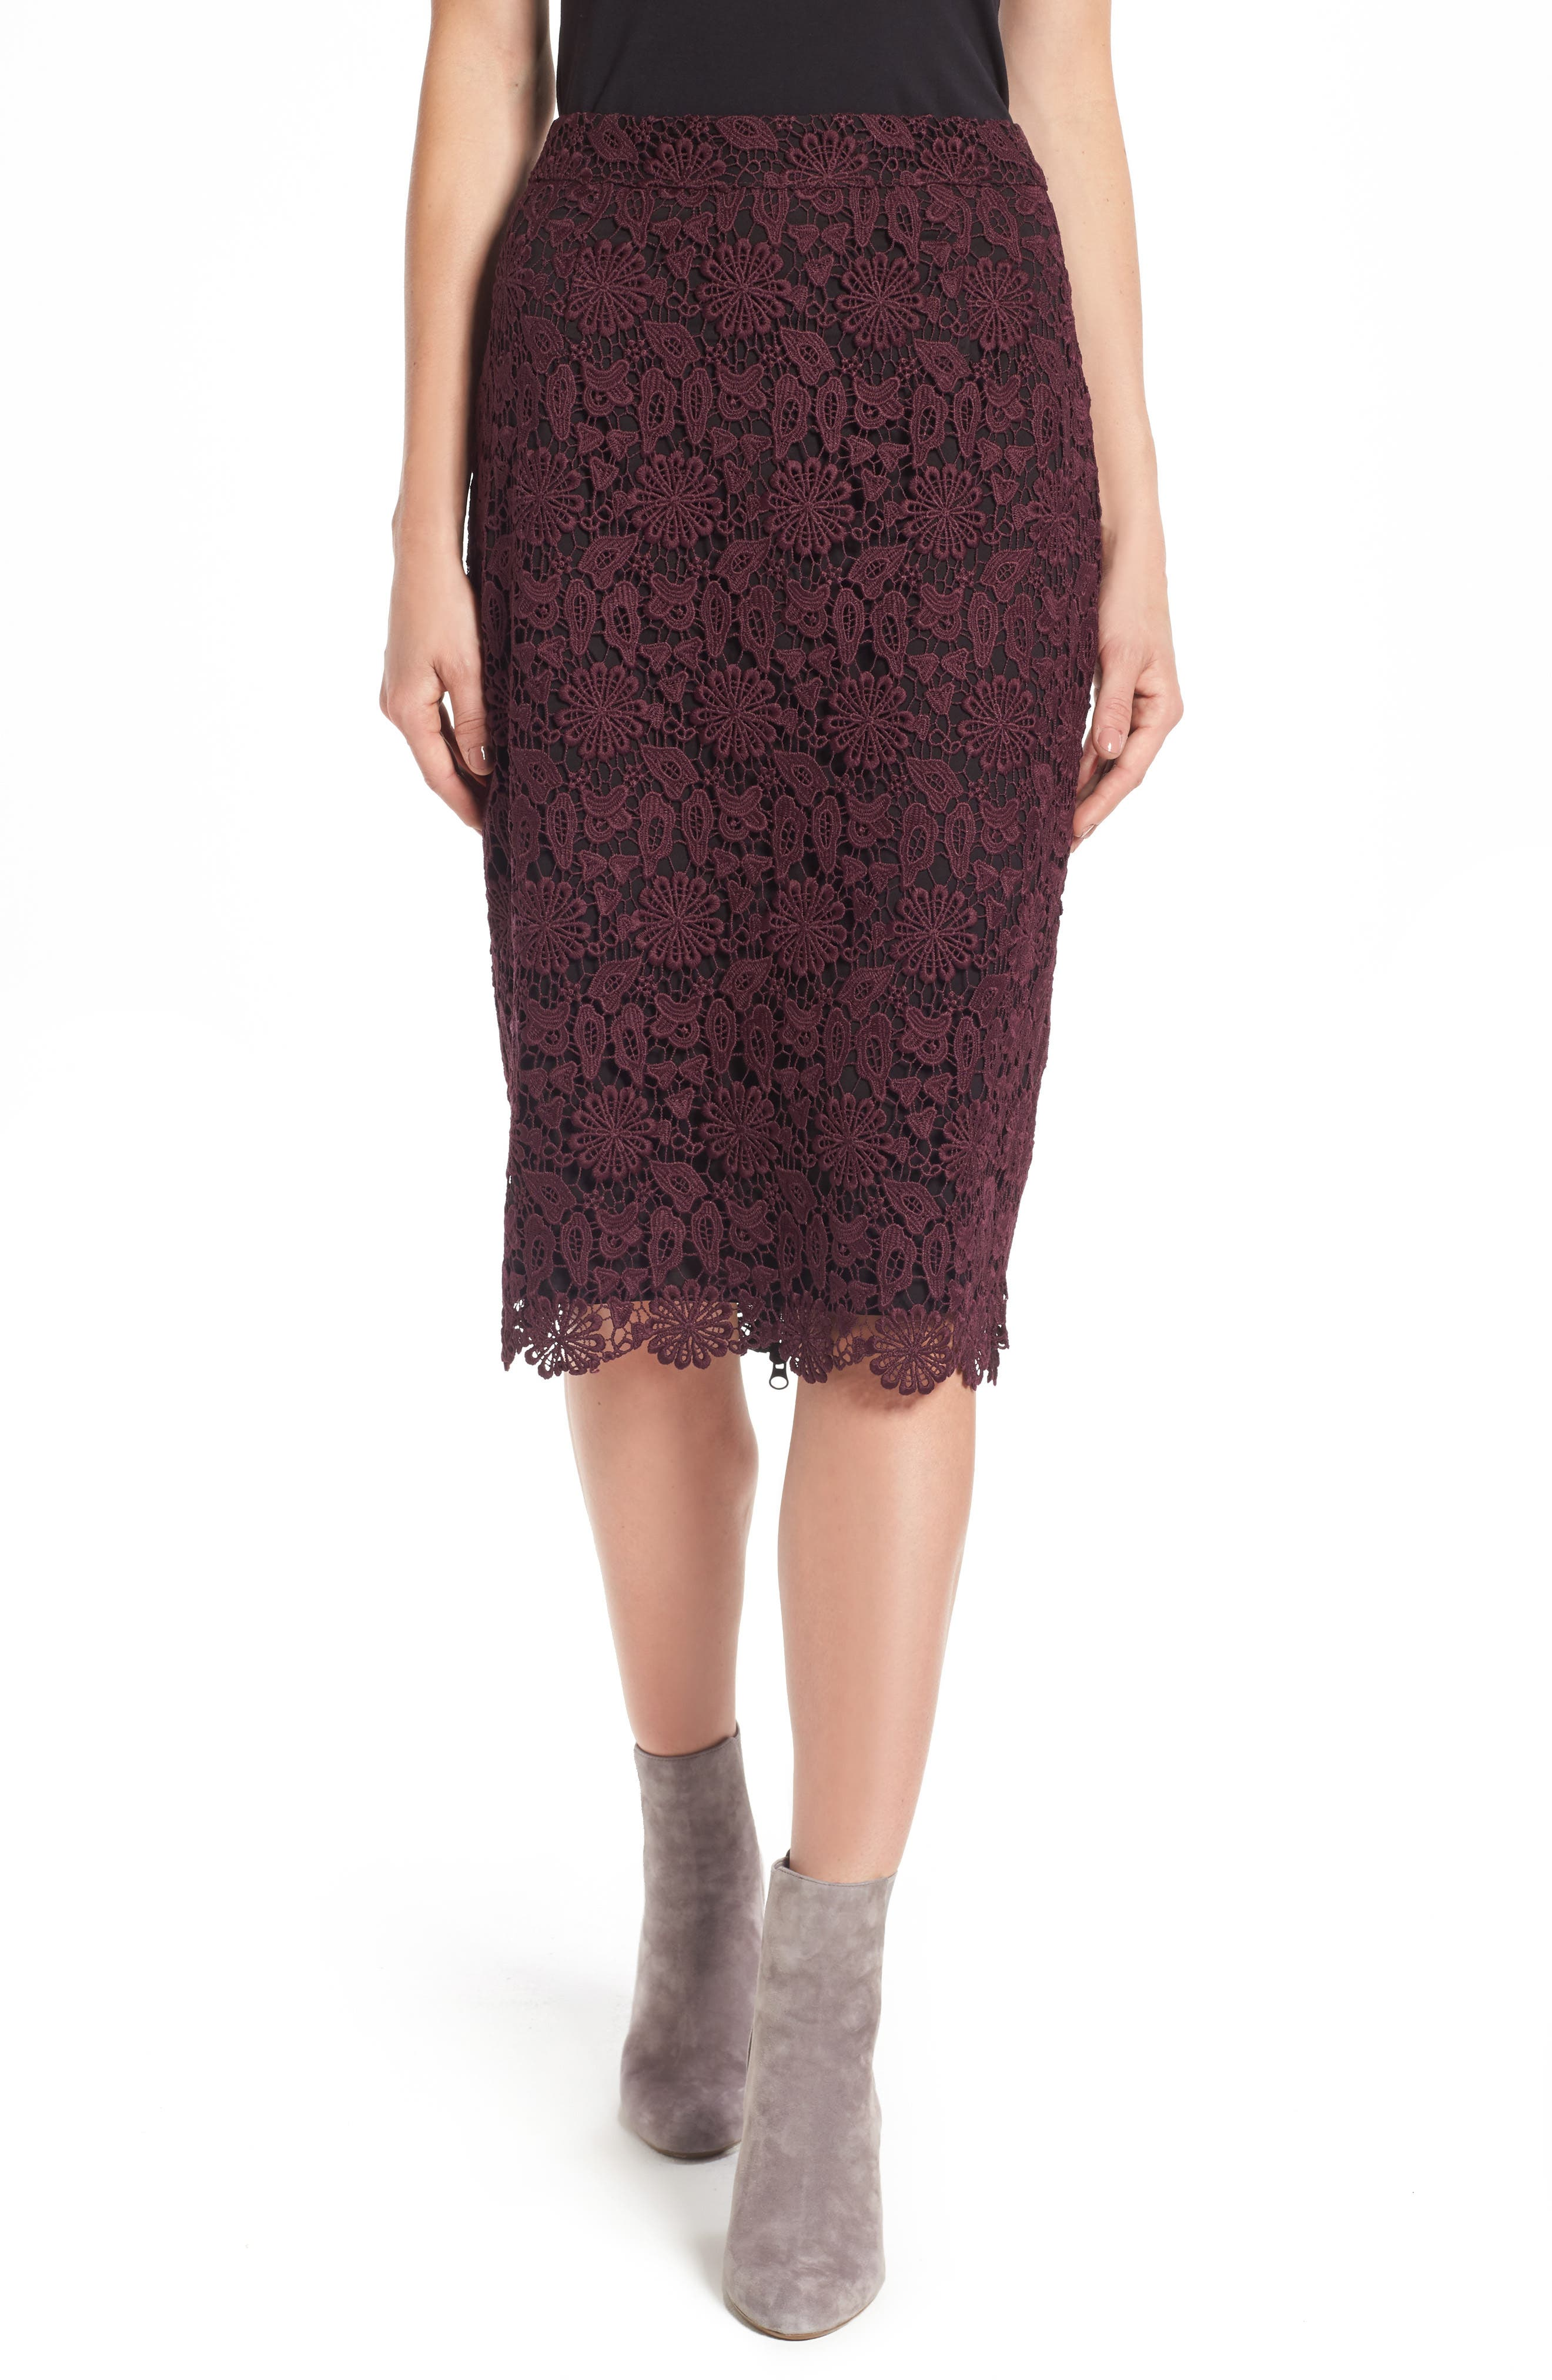 Alternate Image 1 Selected - Halogen® Lace Pencil Skirt (Regular & Petite)